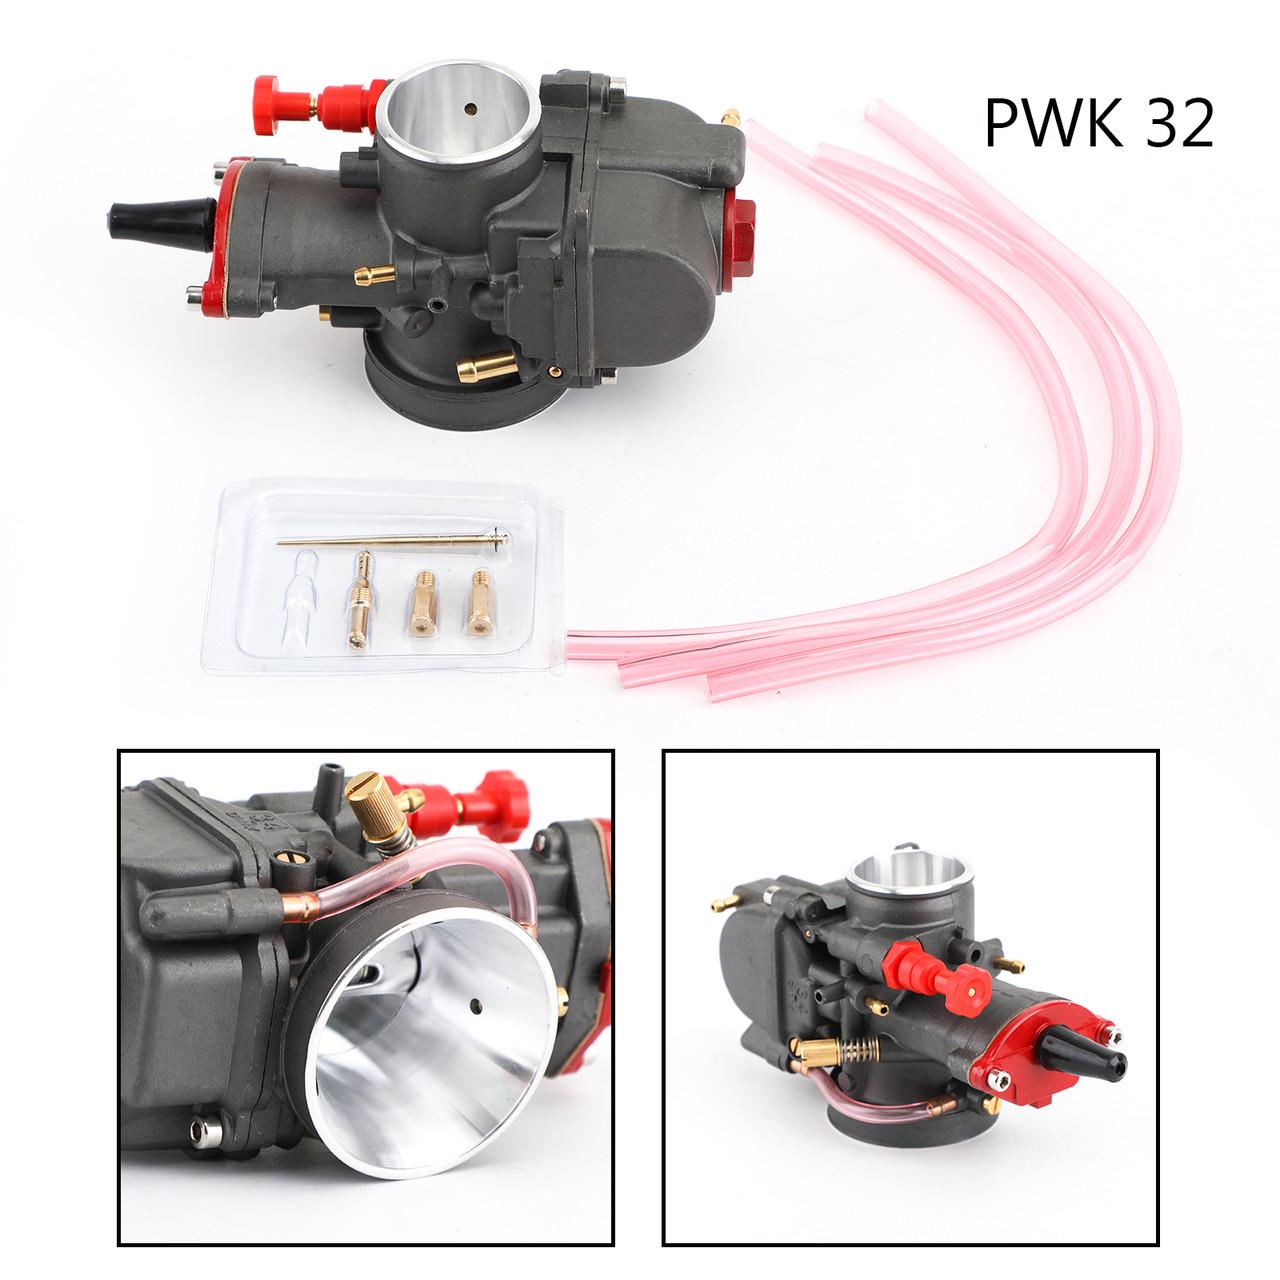 Super Performance KOSO OKO PWK 32mm Power Jet Carburetor Carb For Dirt Bike ATV Black